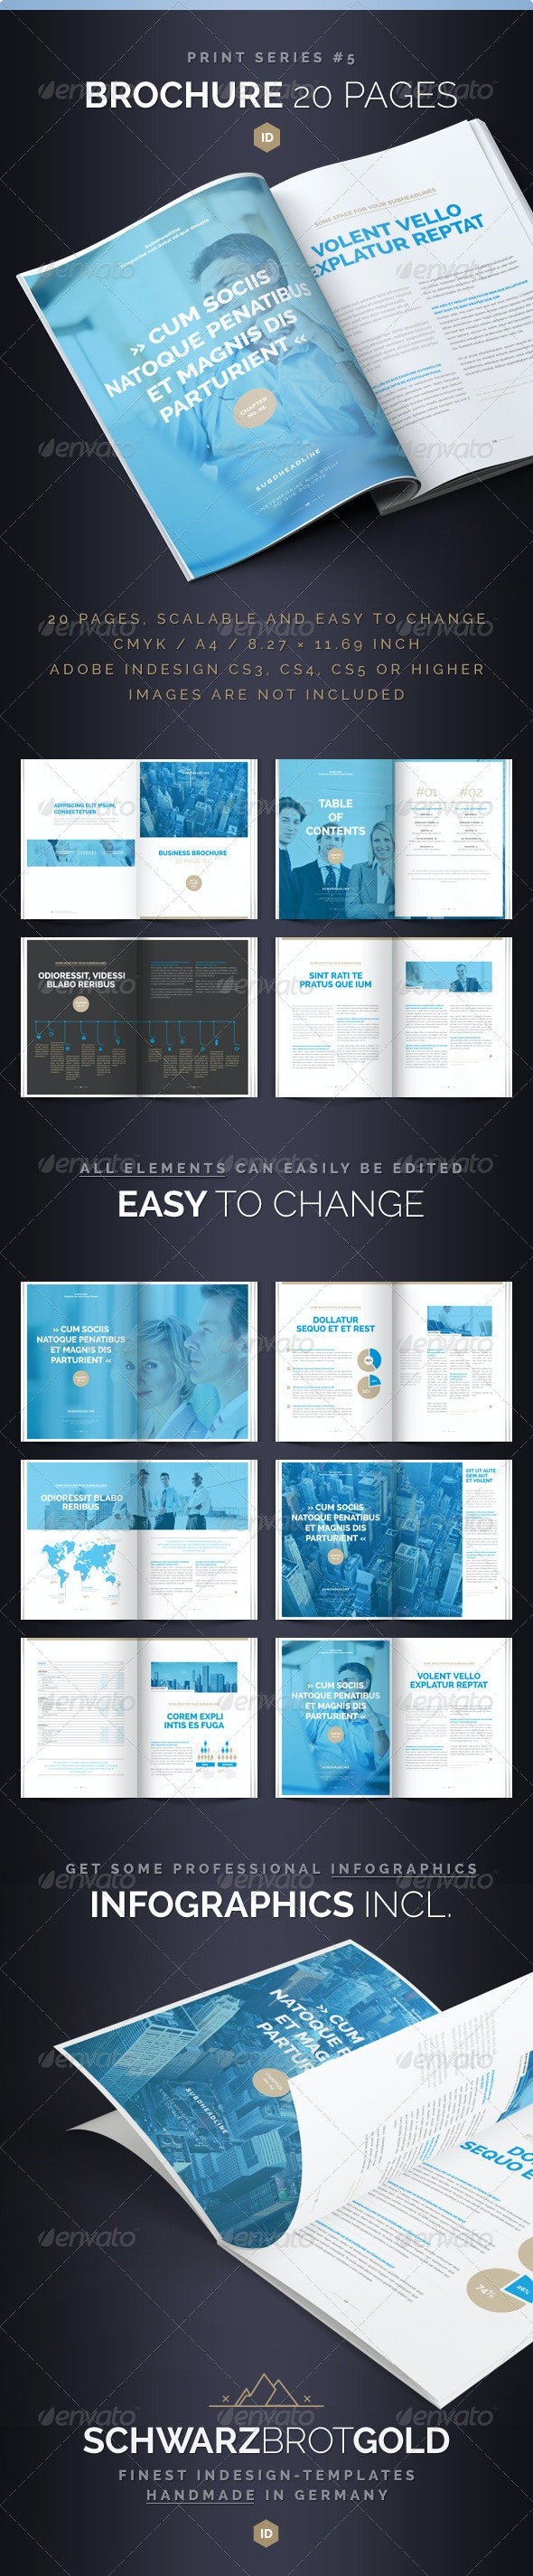 Brochure 20 Pages Series 5 - Corporate Brochures